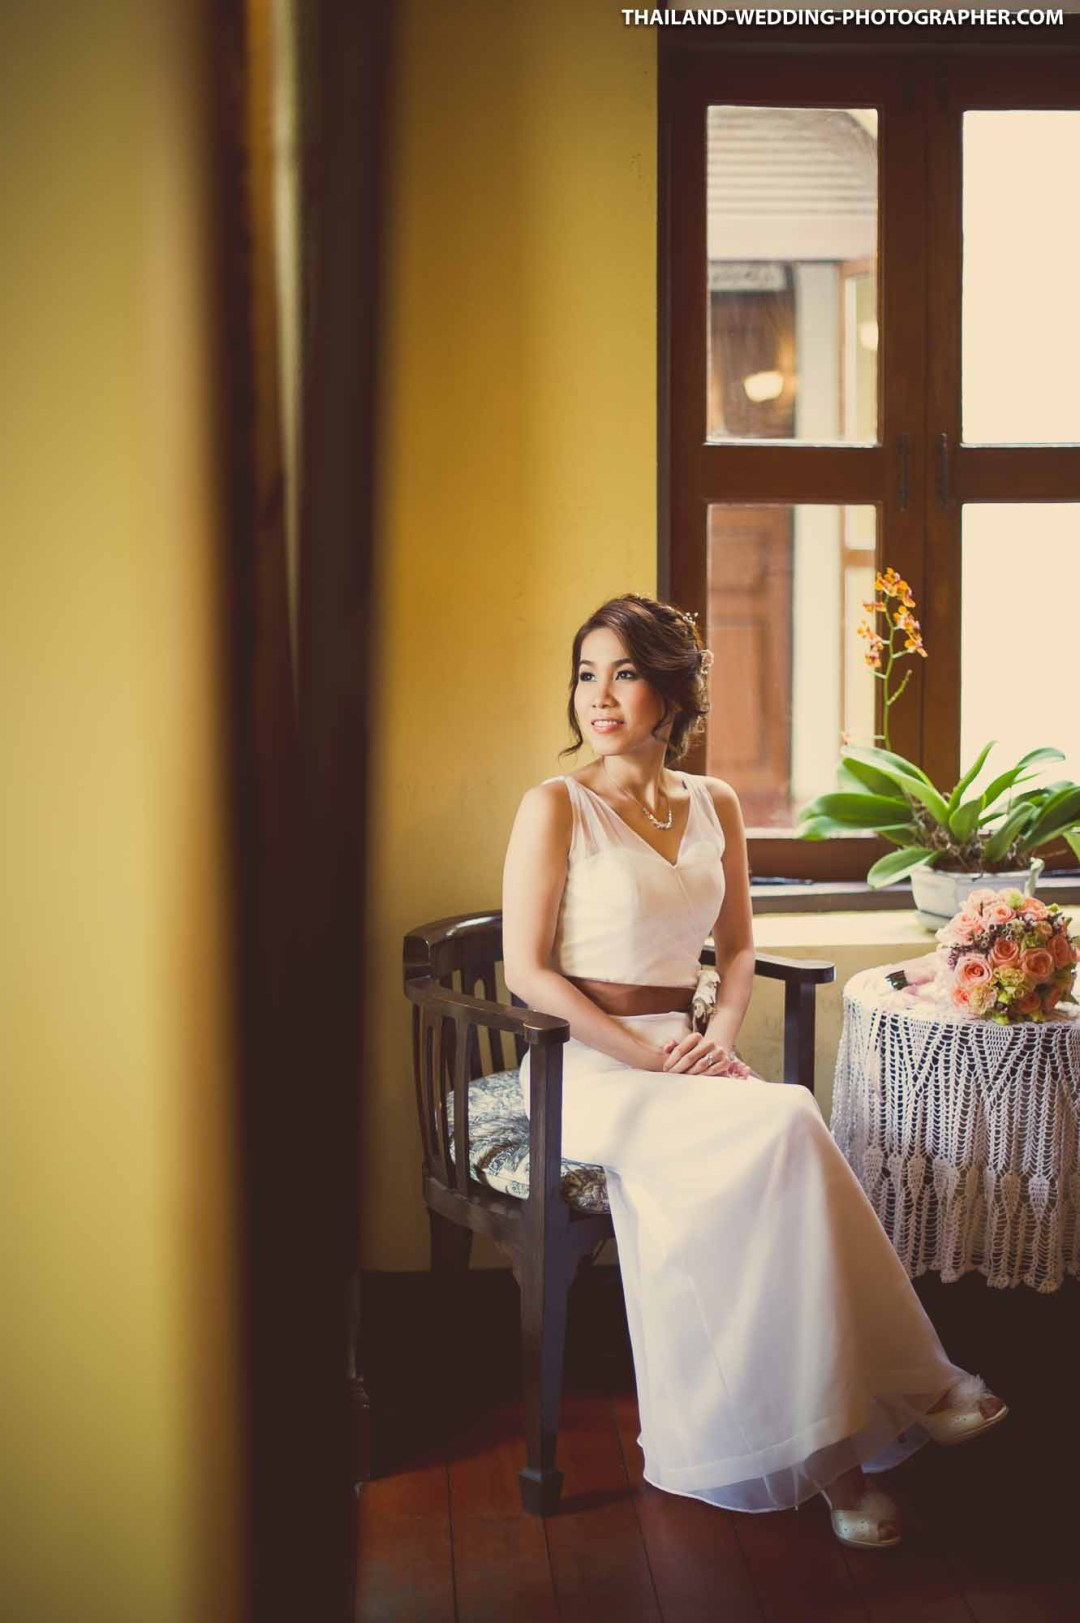 Praya Palazzo Boutique Hotel Bangkok Thailand Wedding Photography